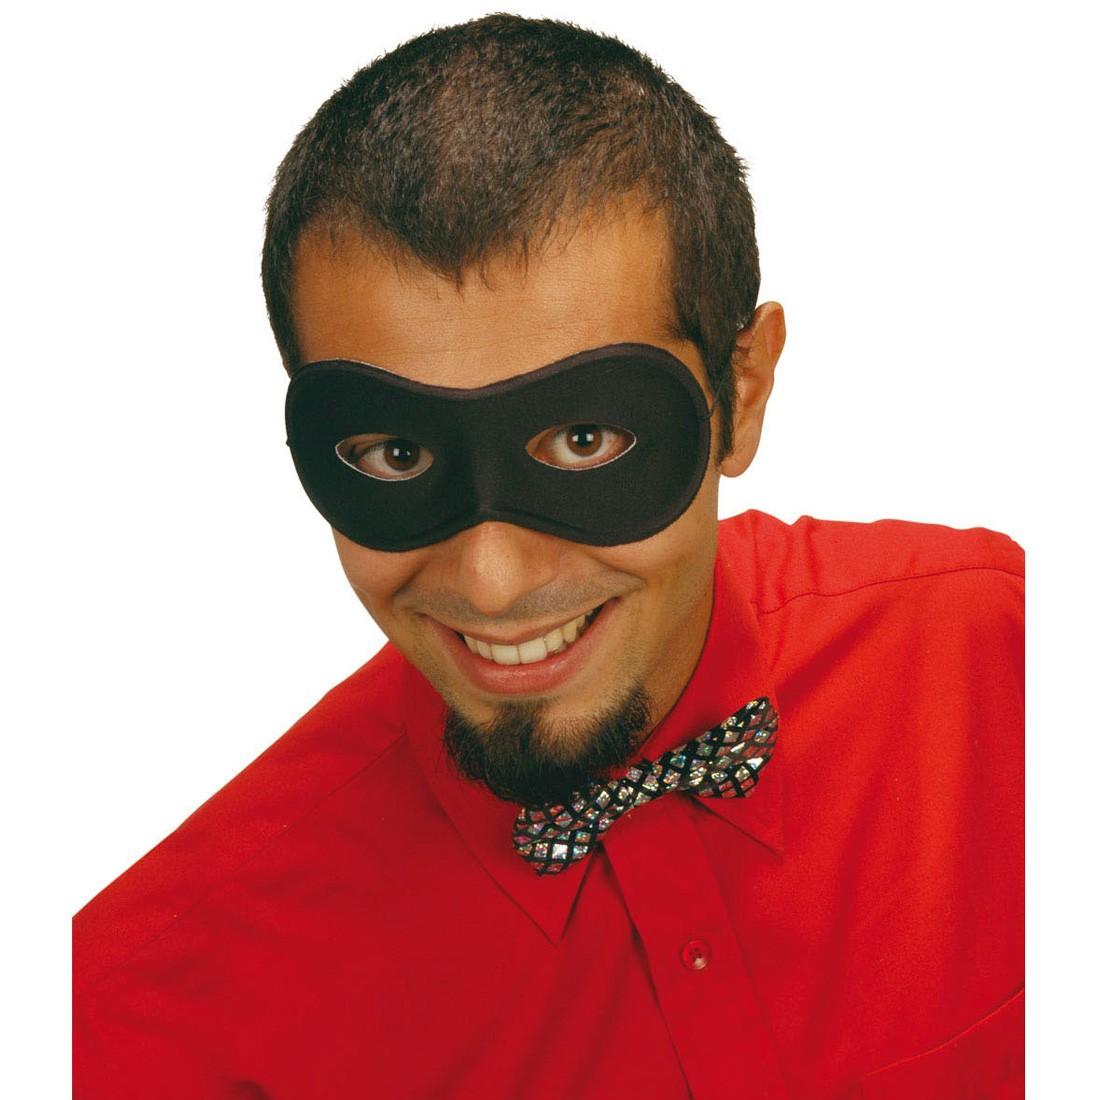 image Robin hood der raecher der besamten